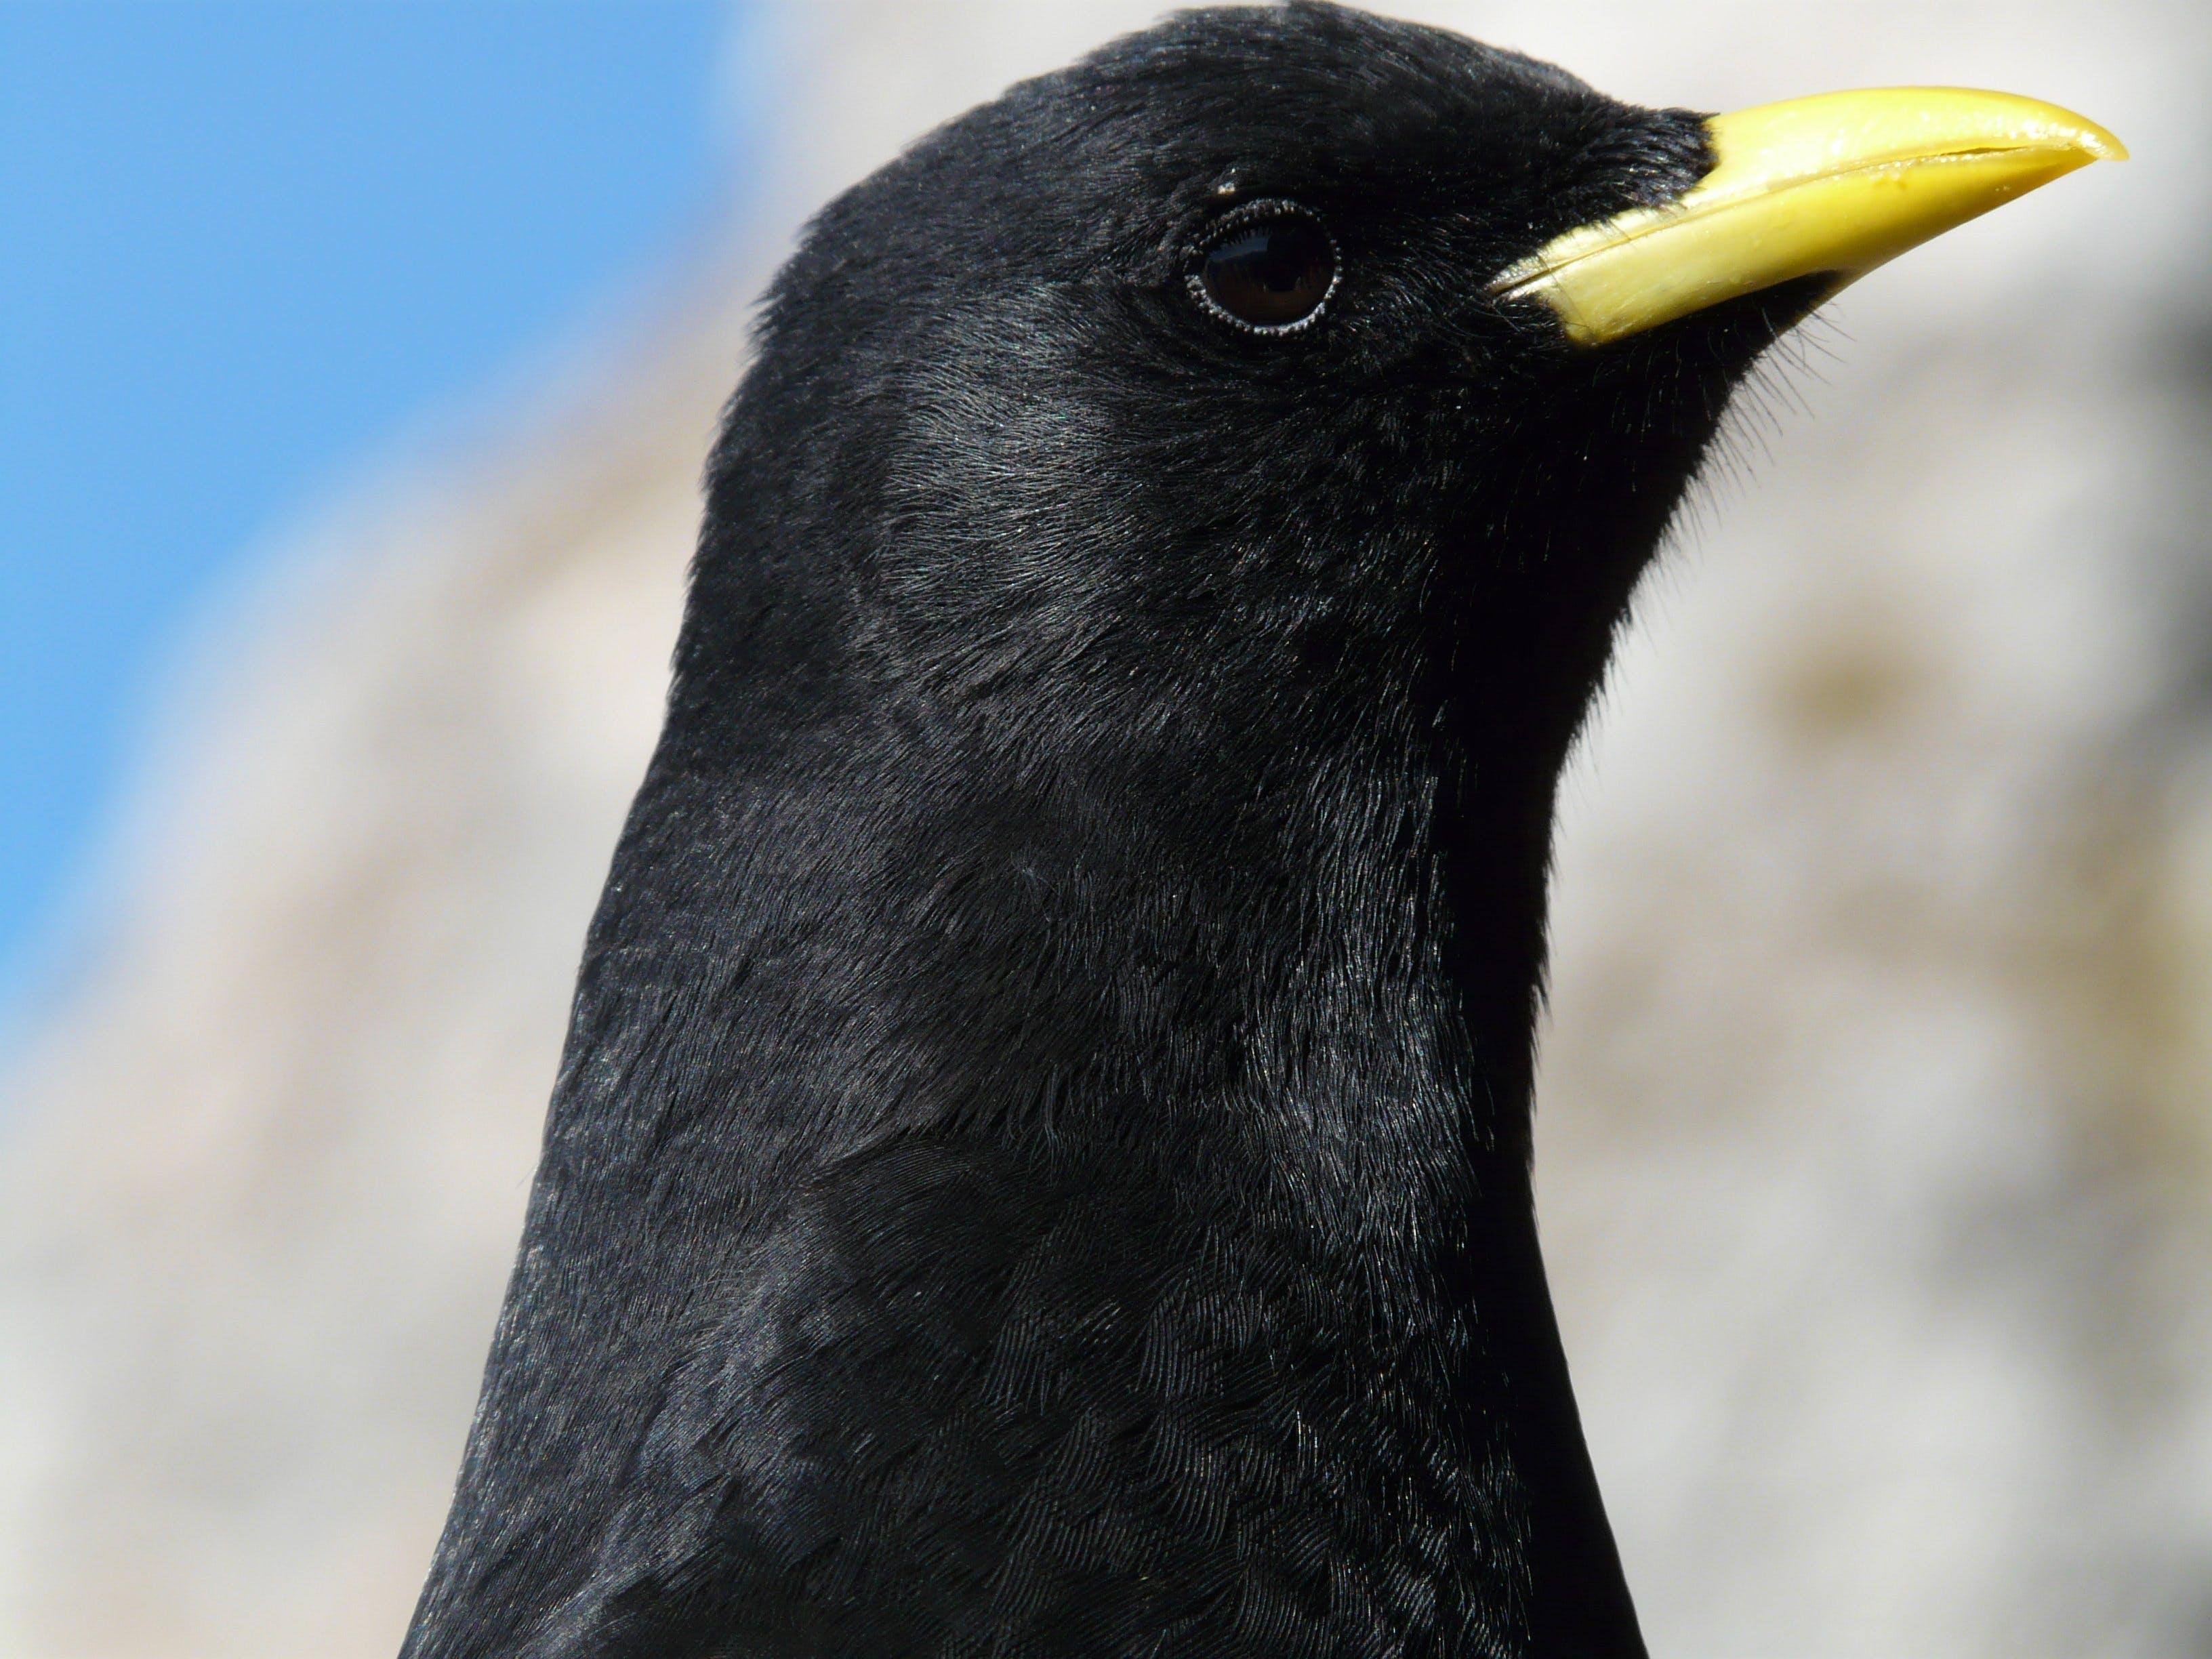 Focus Photography of Black Bird